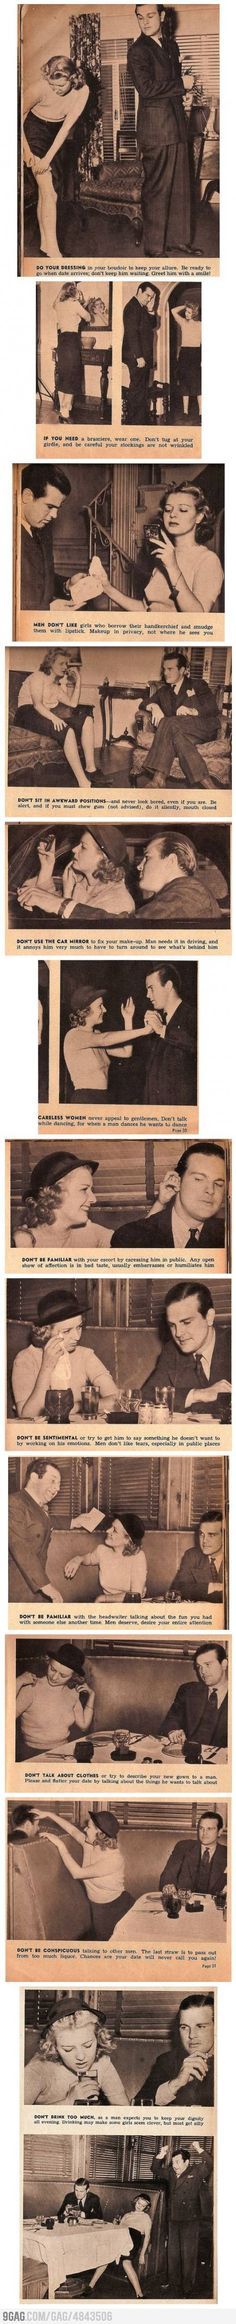 Dating Advice for Women circa 1950